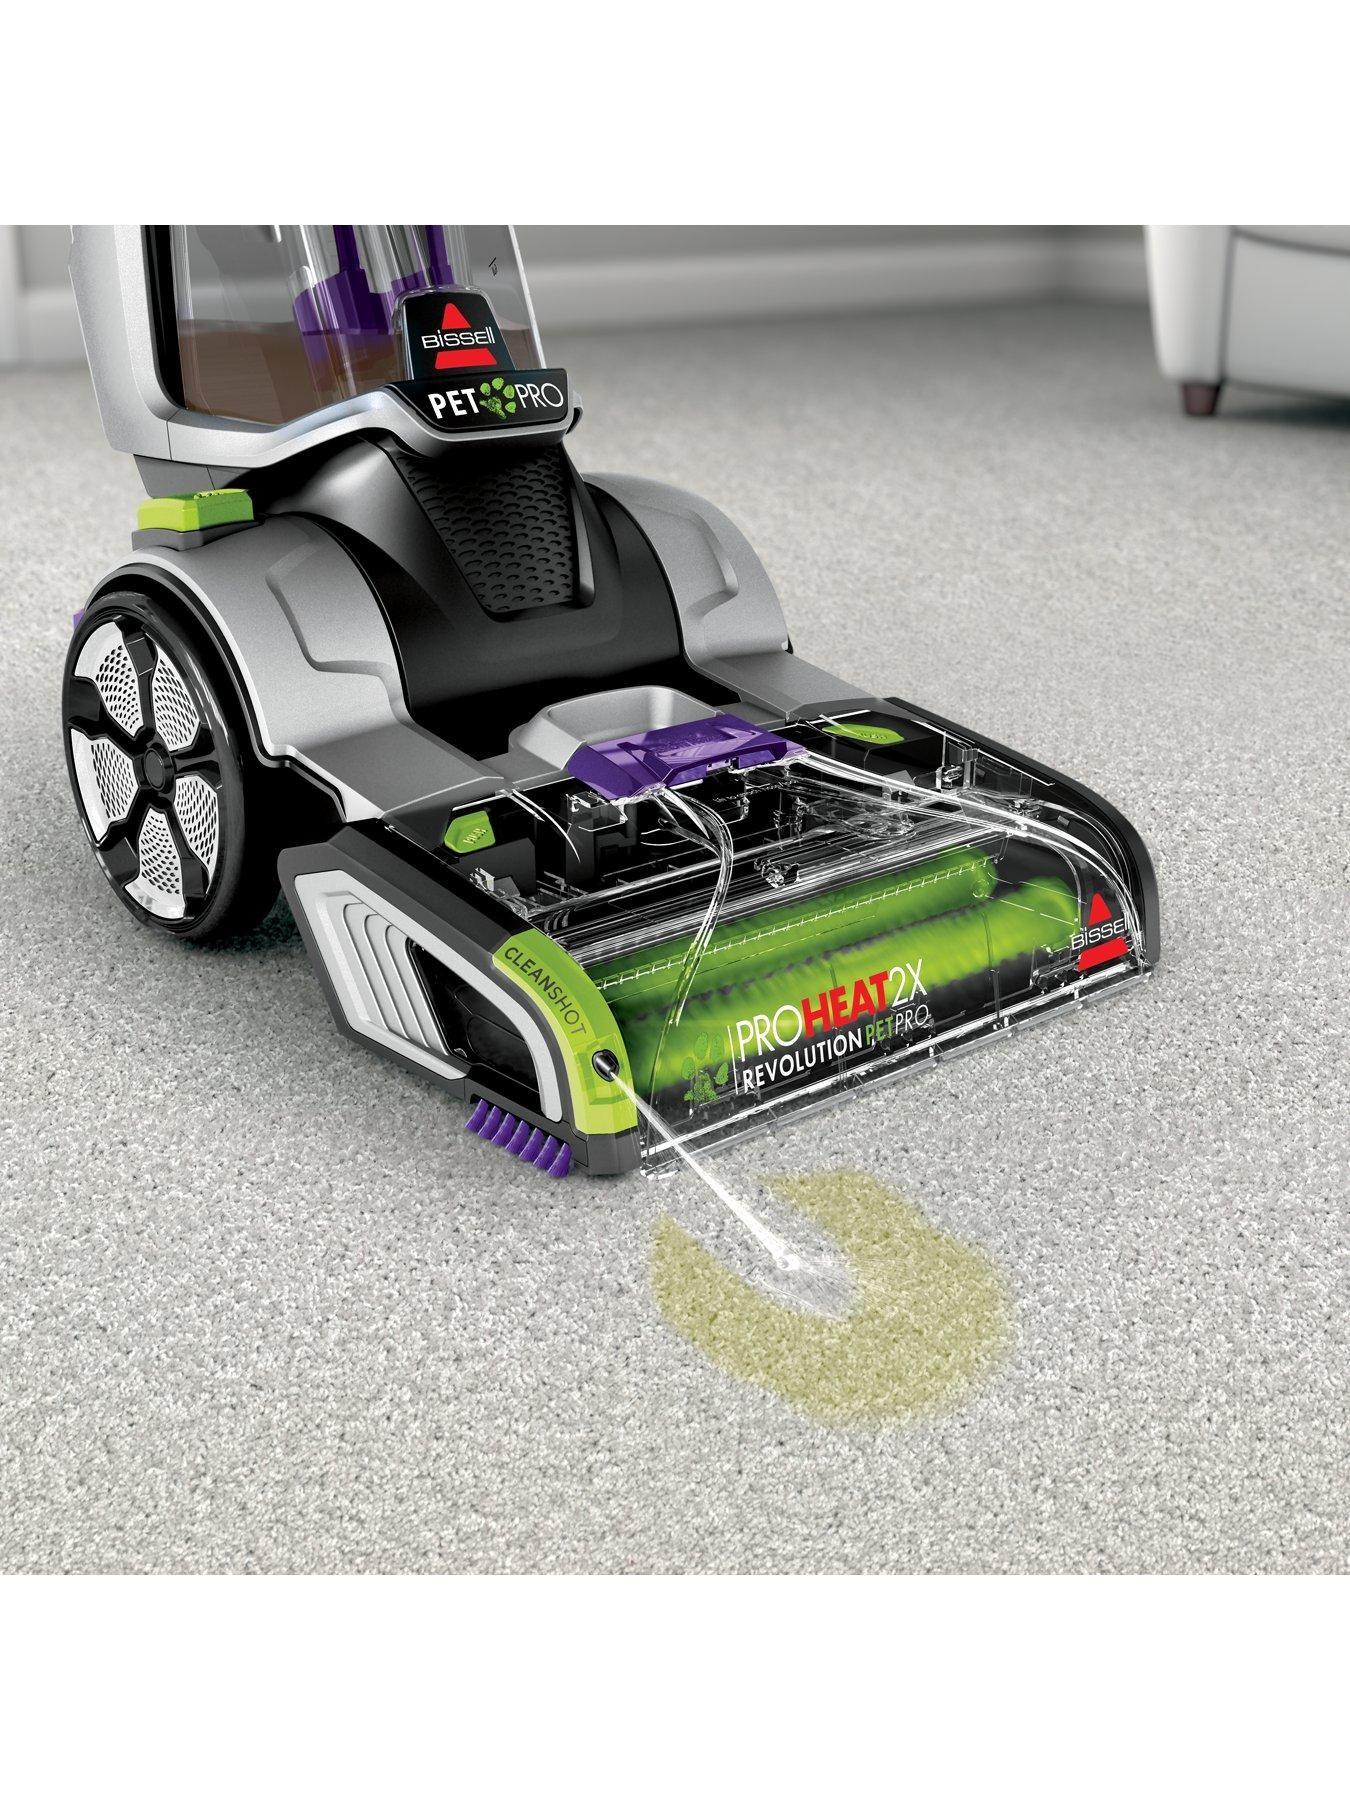 Bissell bissell proheat 2x revolution pet pro carpet